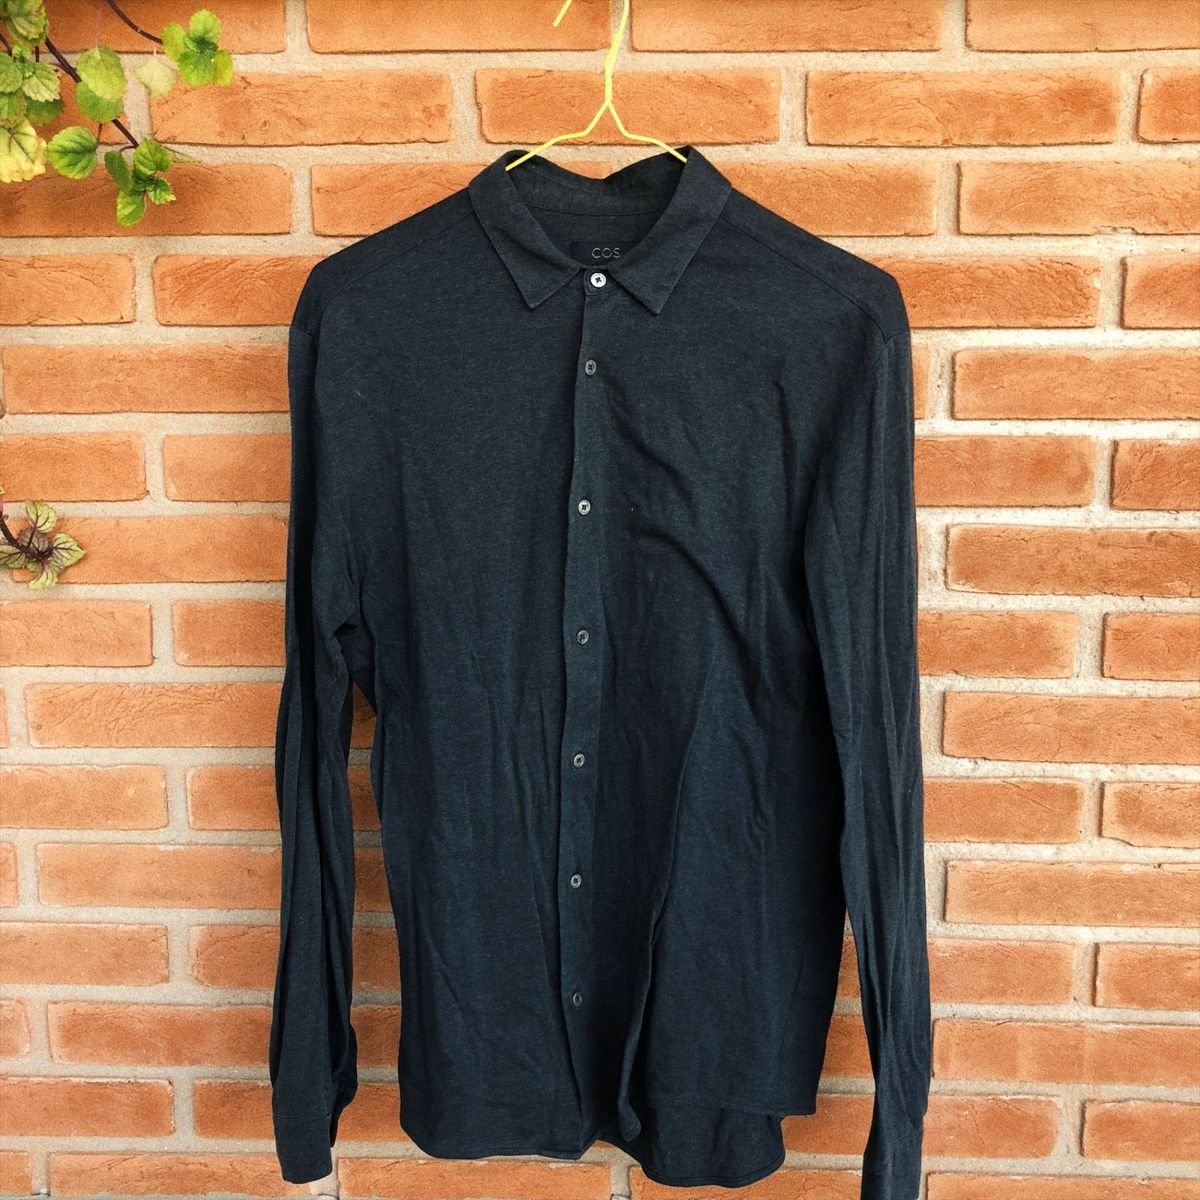 camisa de malha - camisas cos